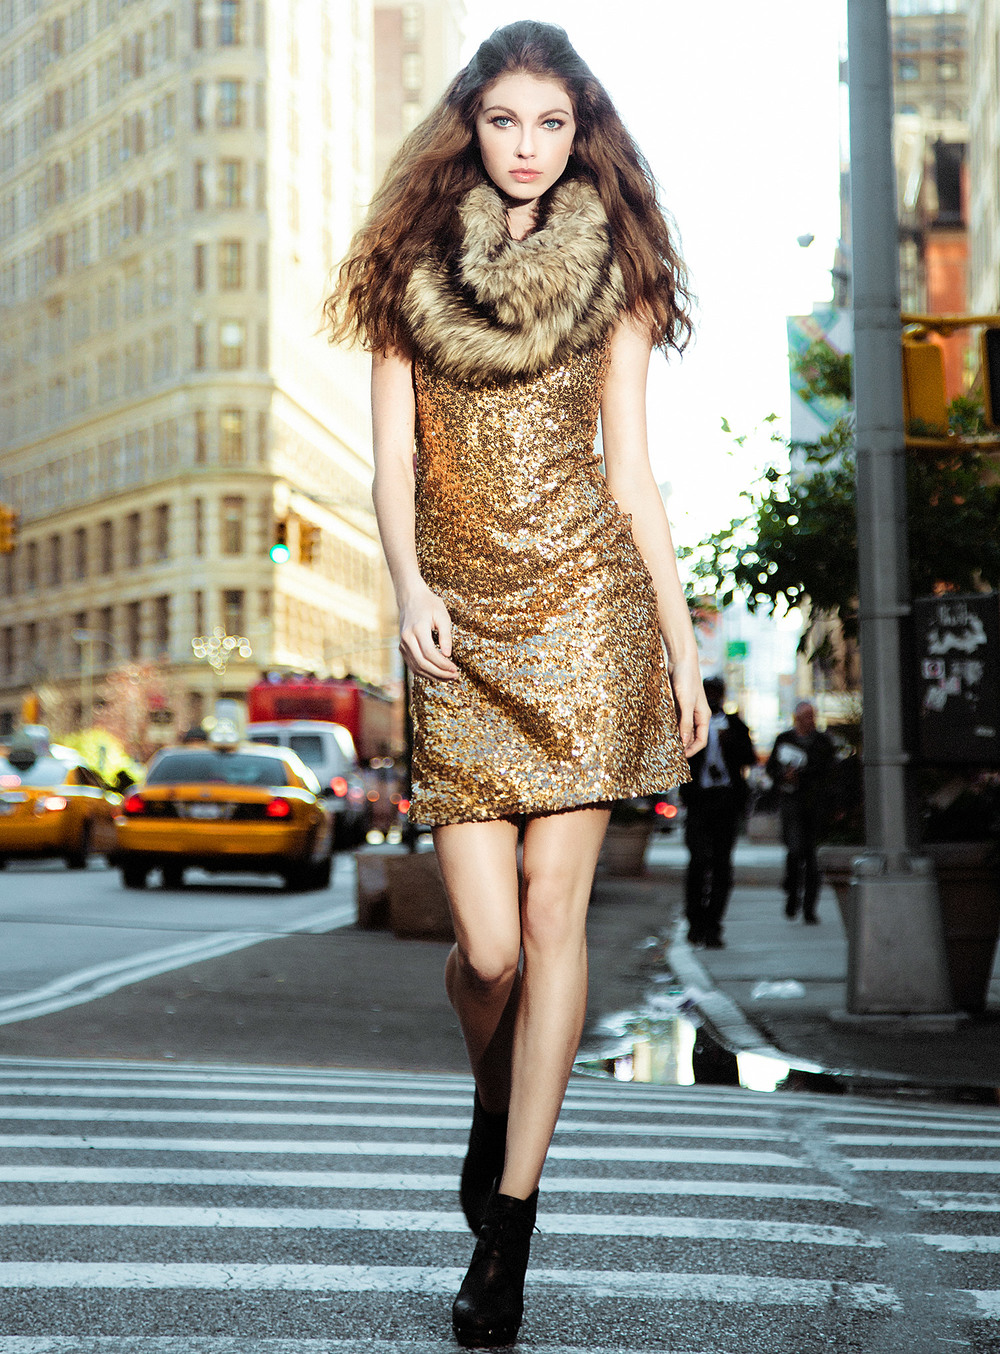 new-york-models-amanda.jpg